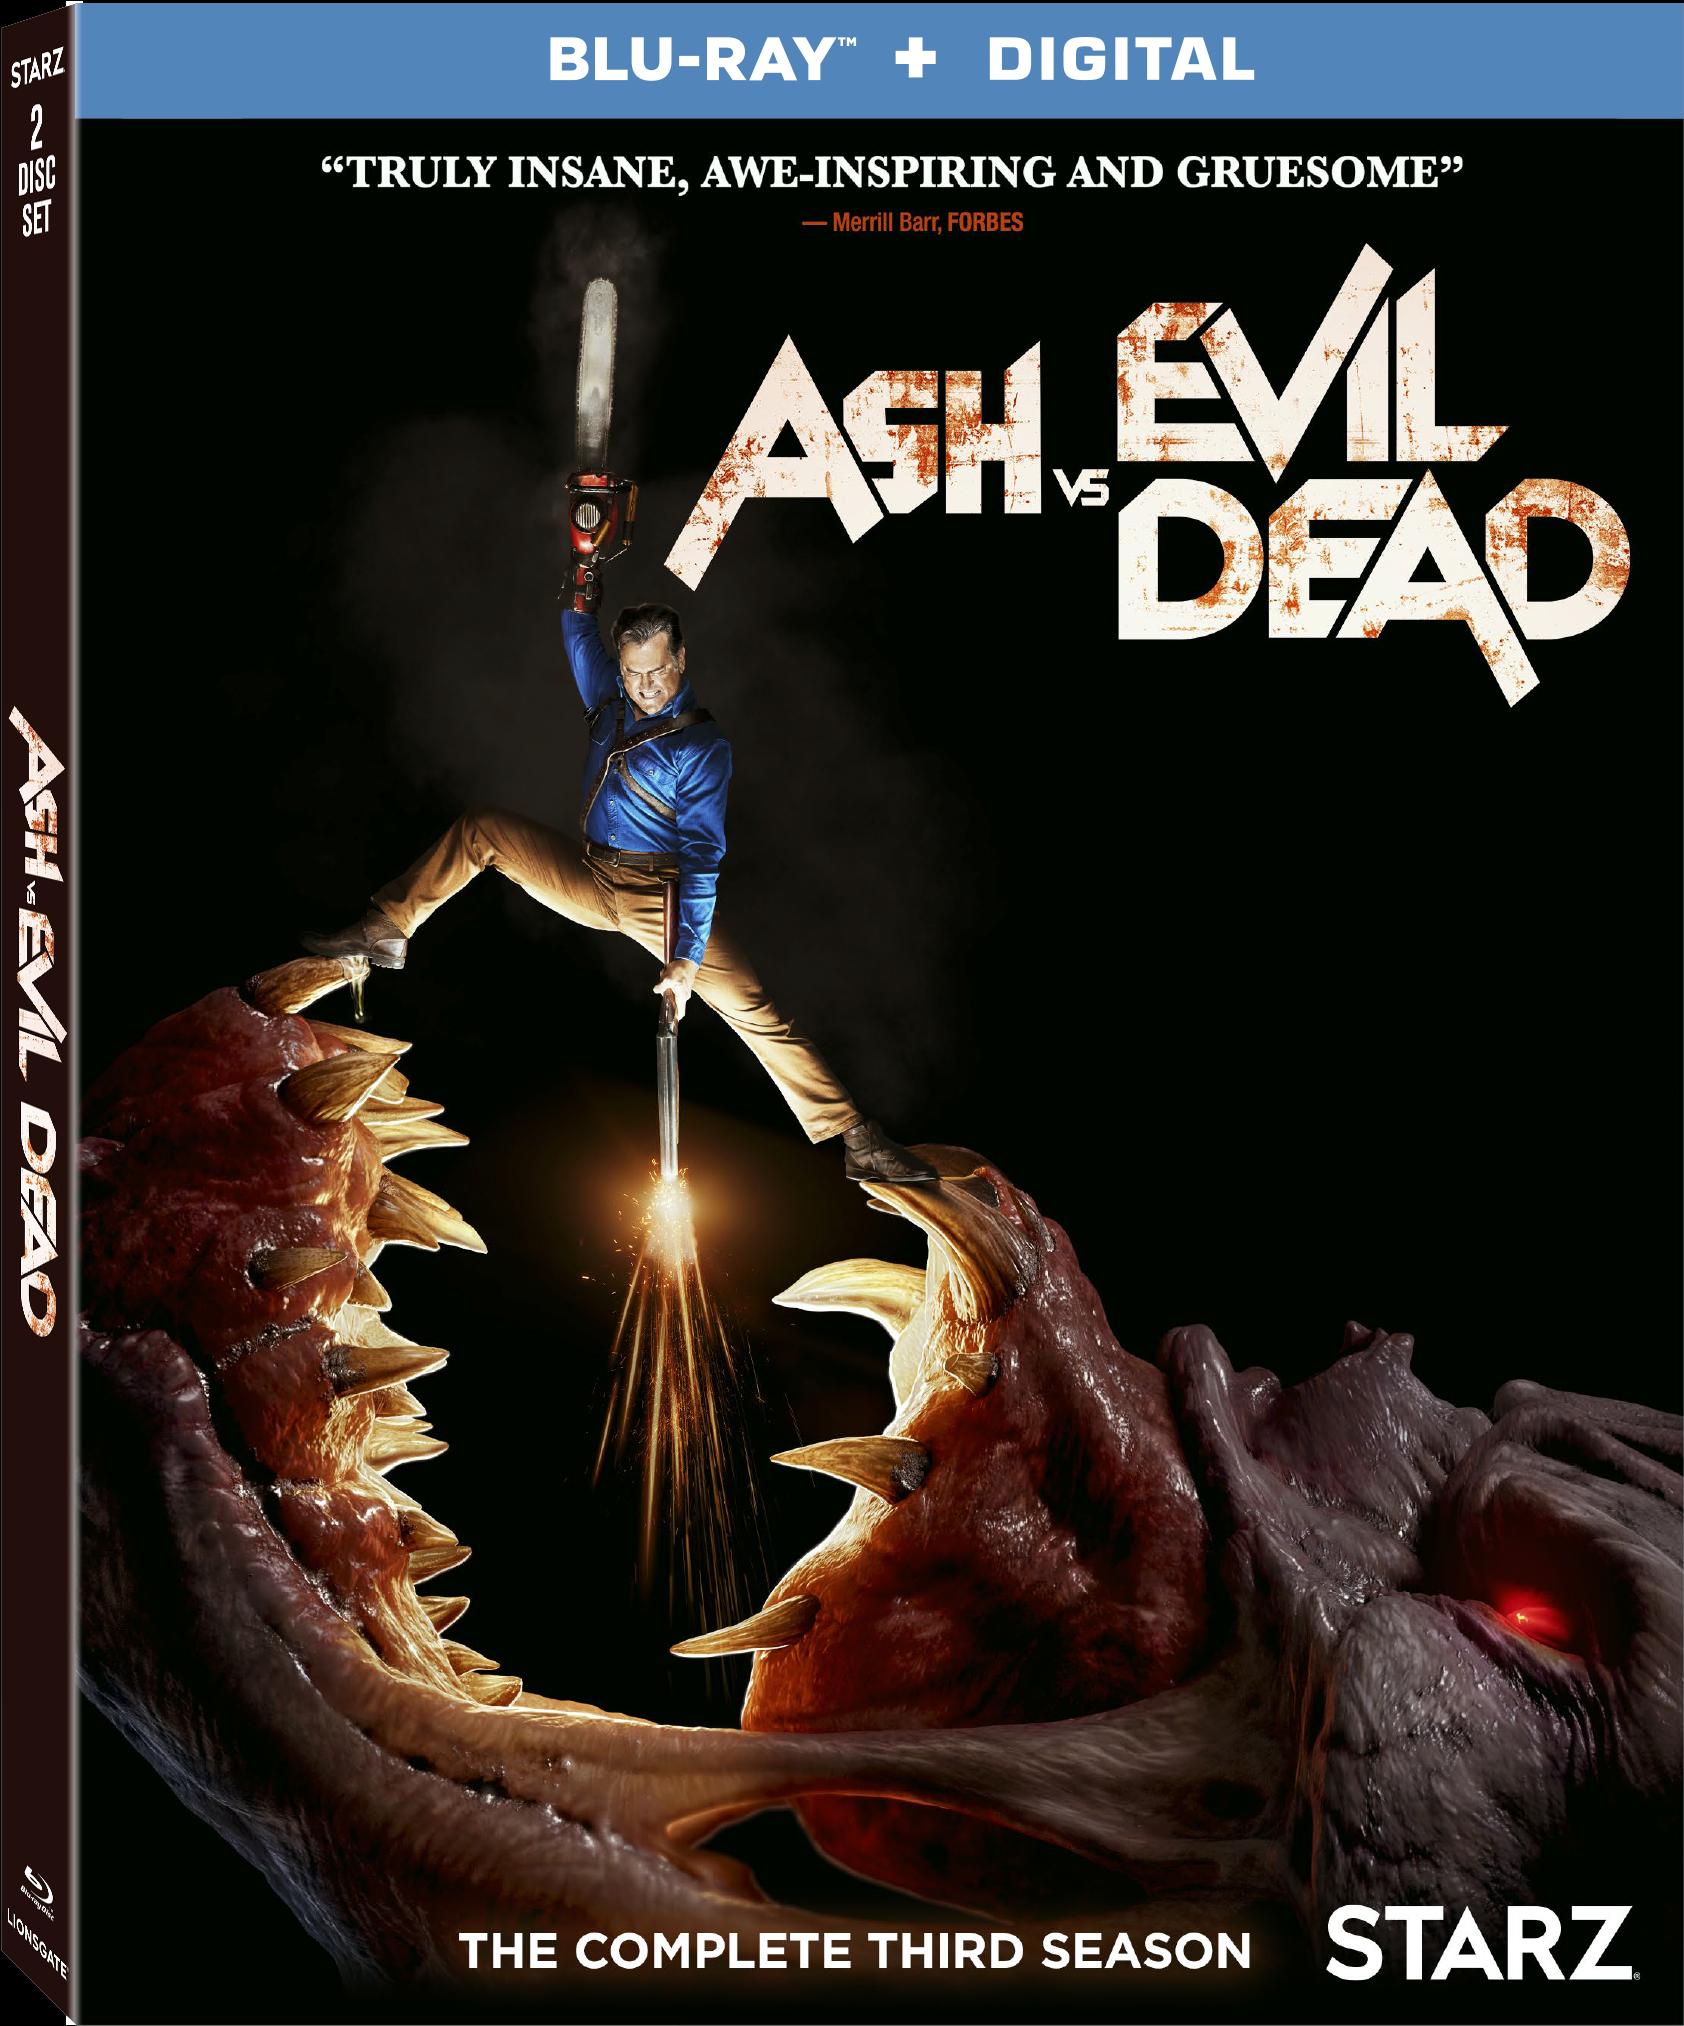 Season 3 Blu-ray Combo Pack Cover - Ash Vs Evil Dead Season 3 Dvd (1920x2550), Png Download